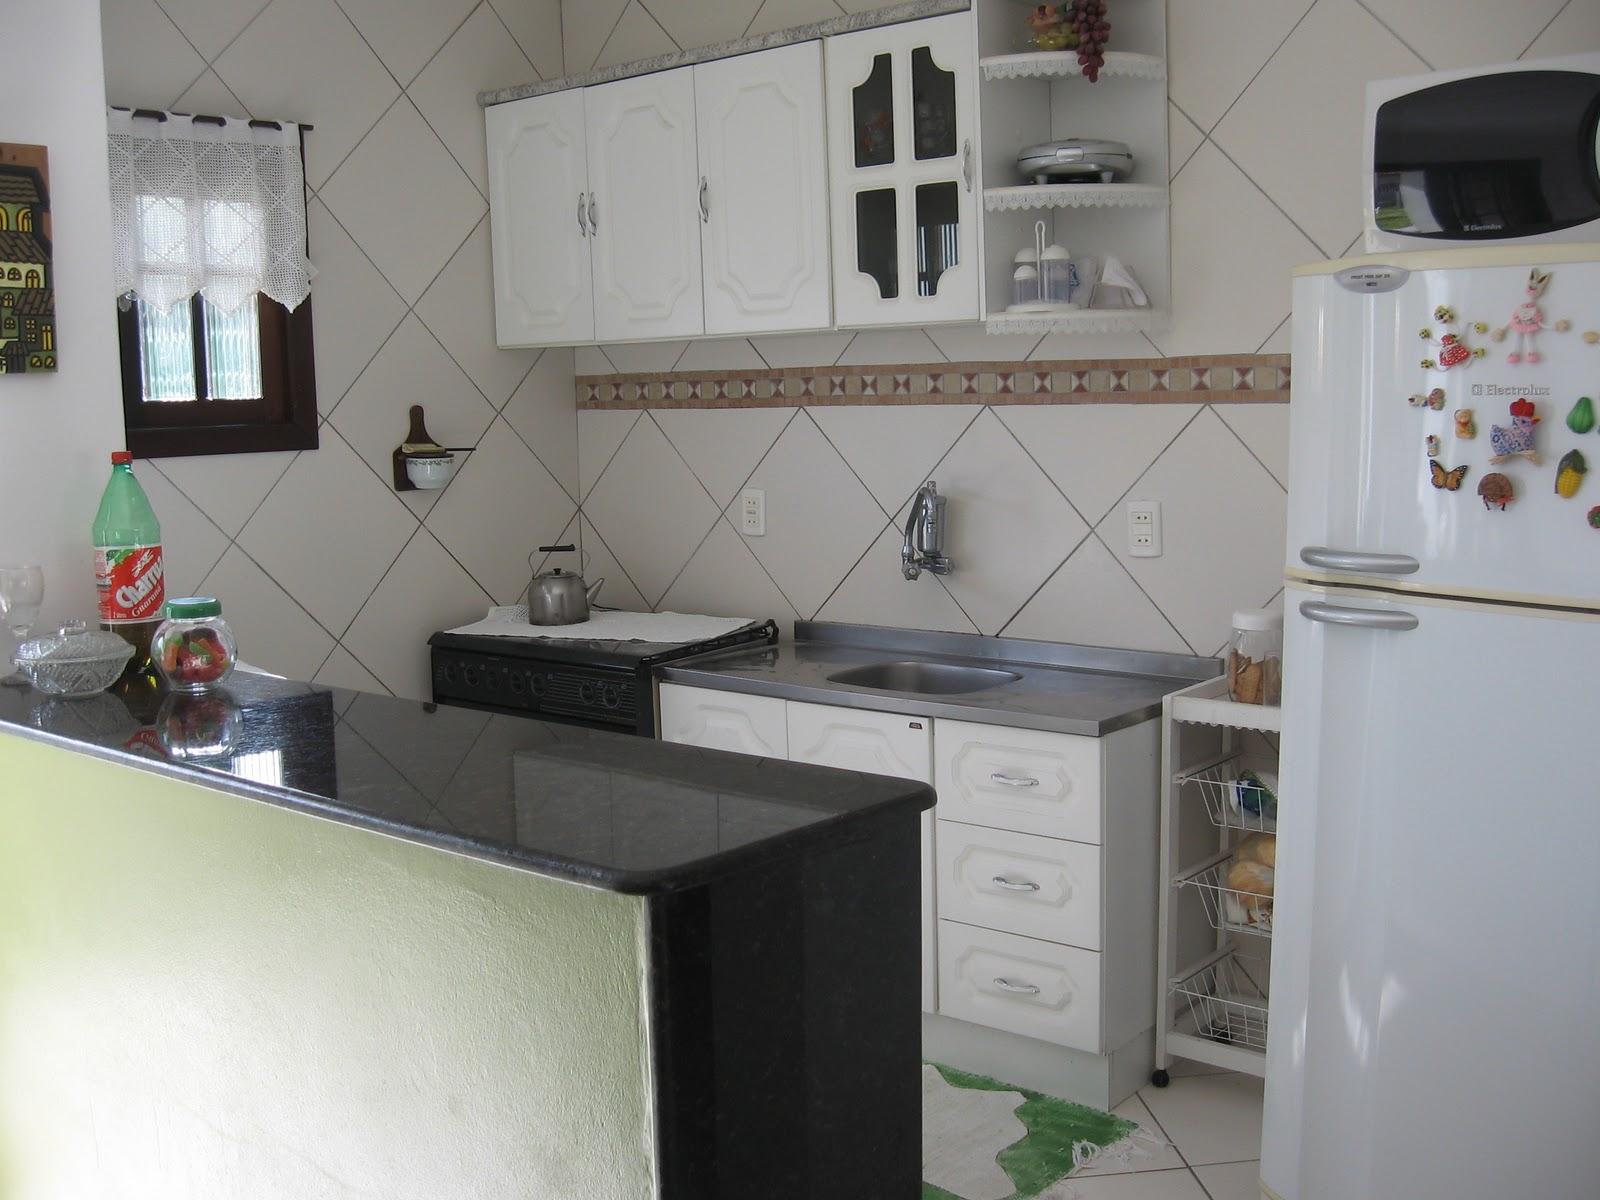 Cozinha estilo americana e mesa para churrasco #664940 1600 1200